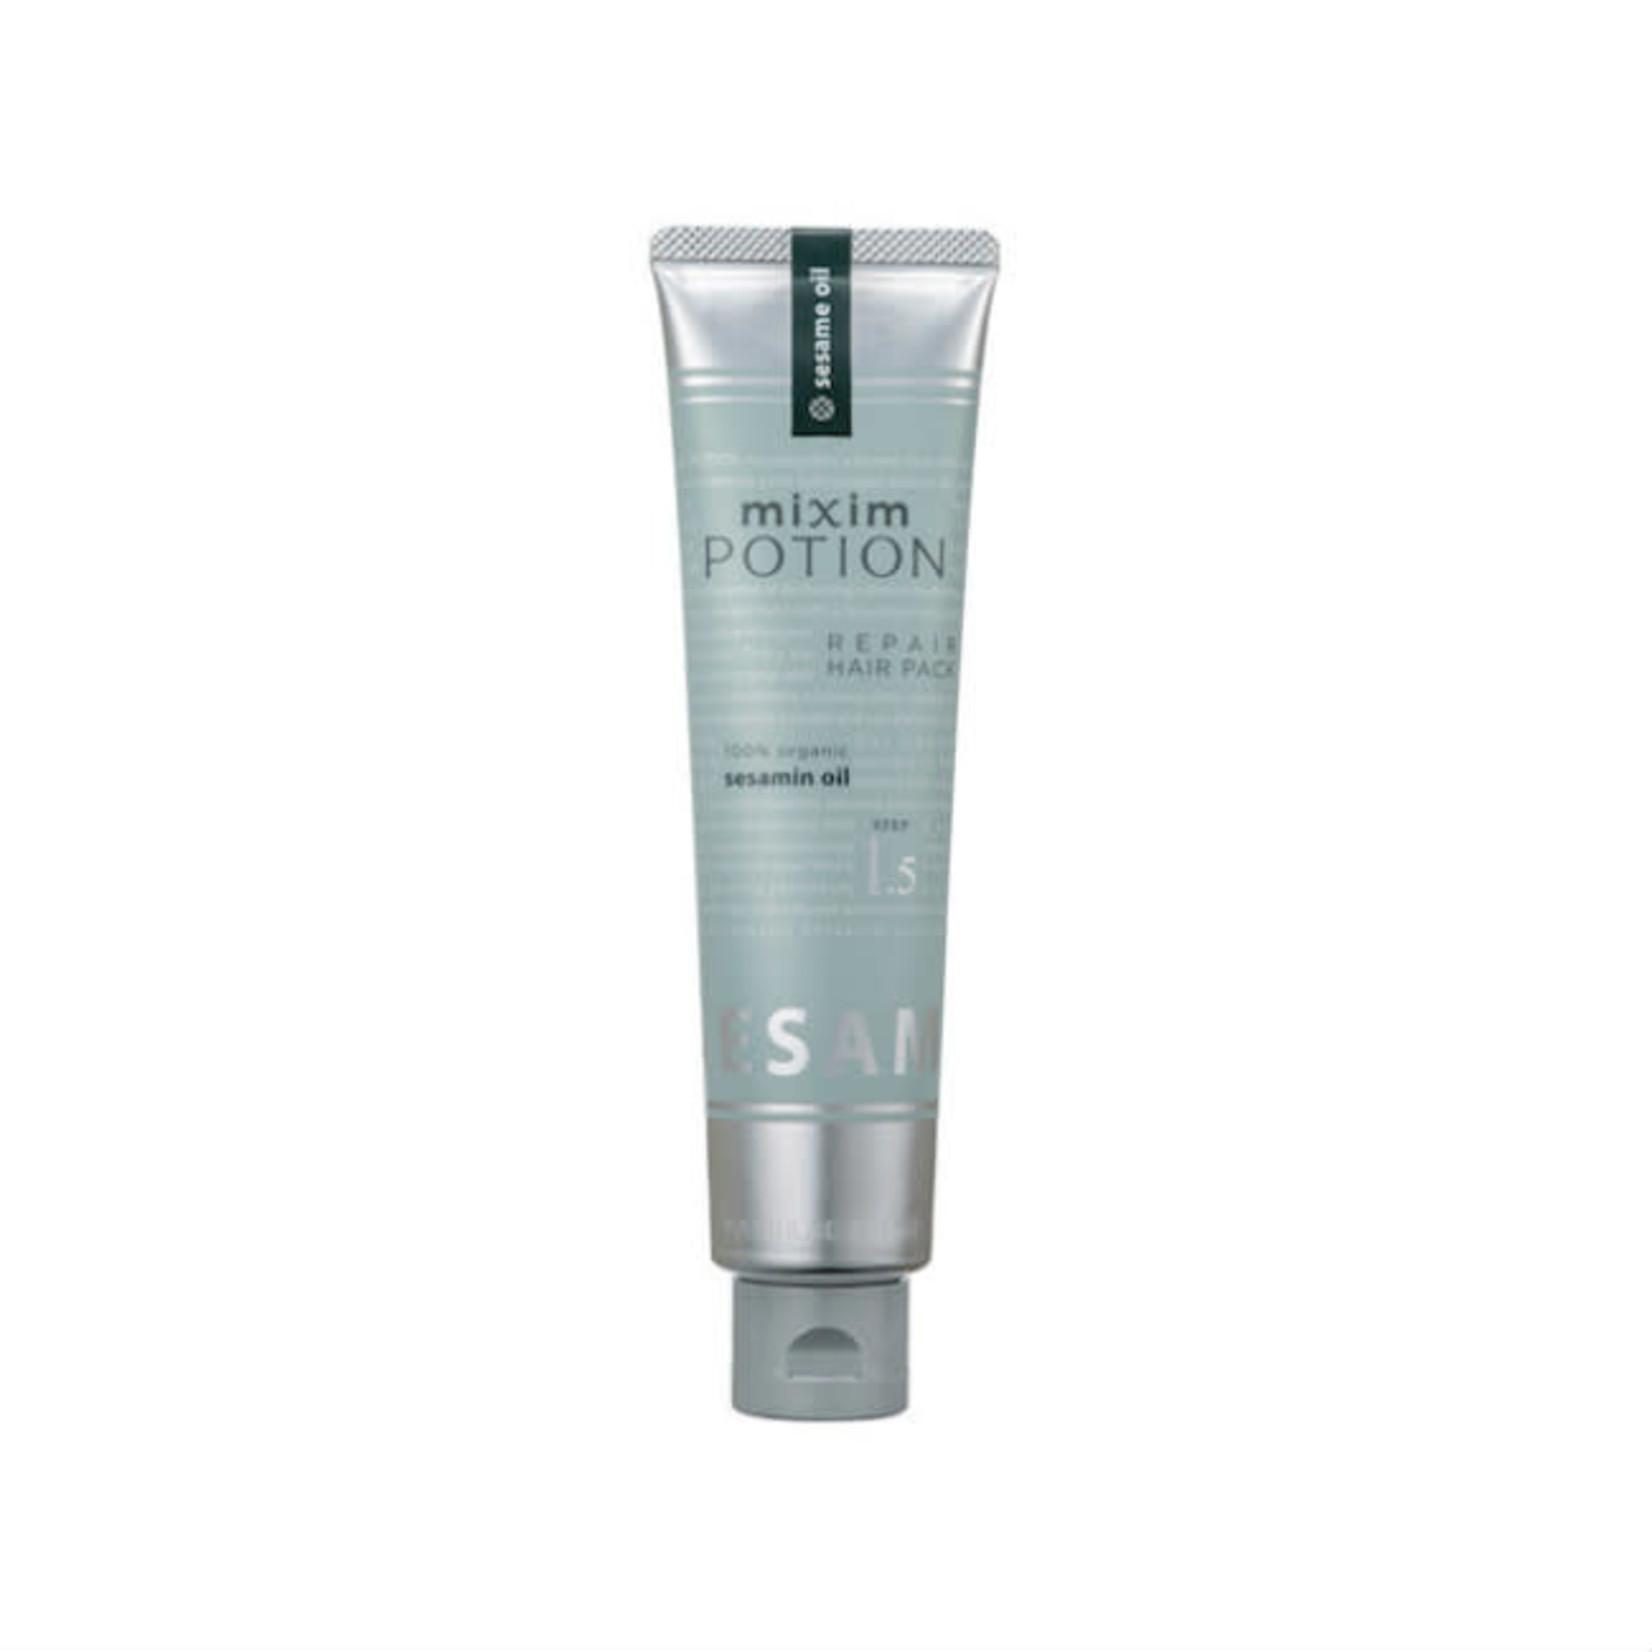 Vicrea Mixim Potion Deep Repair Hair Pack Step 1.5 130ml